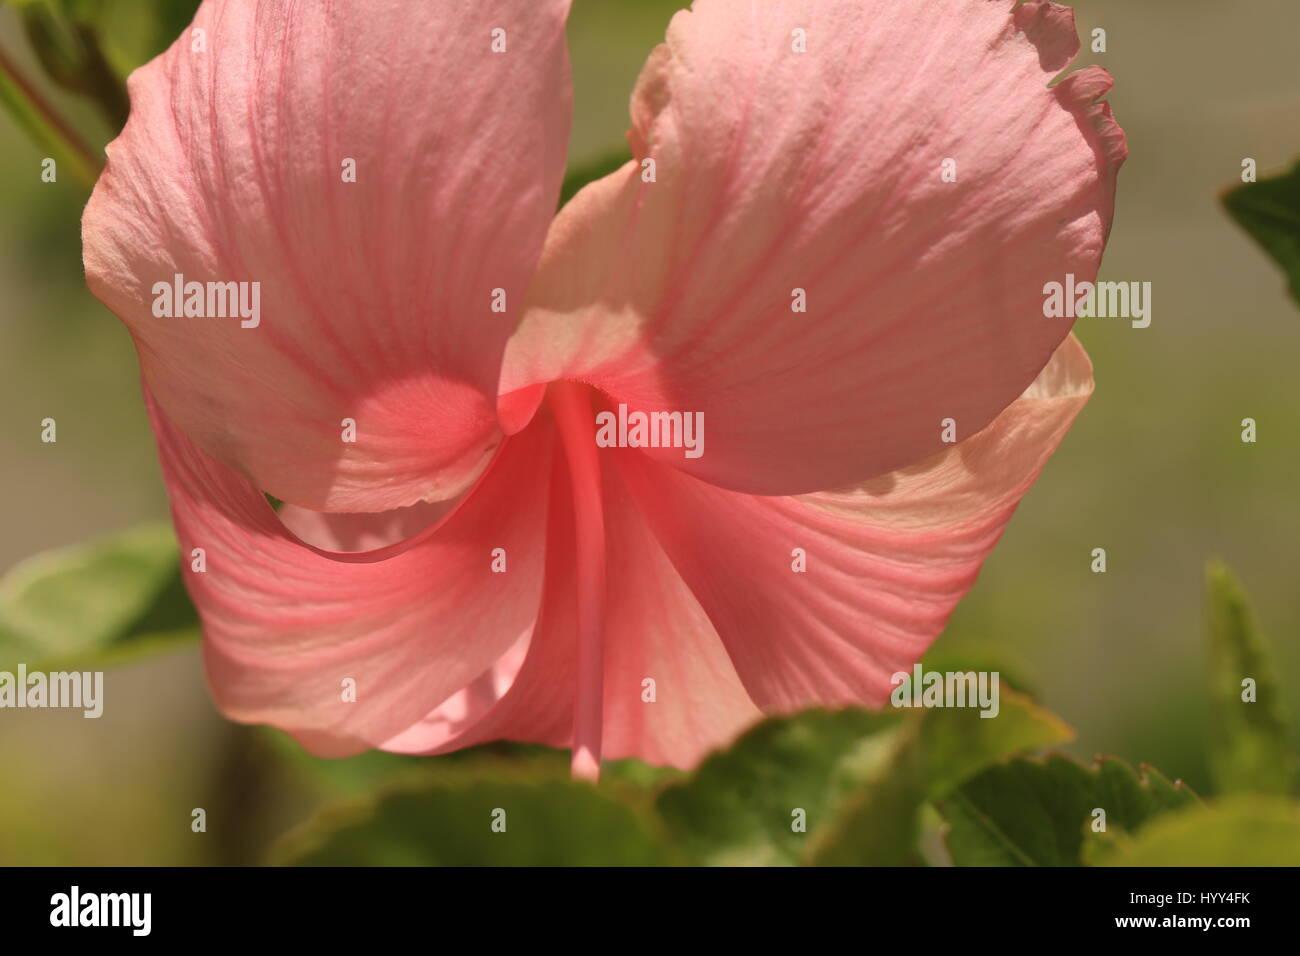 Tropical pink hibiscus growing in jamaica stock photo 137664567 alamy tropical pink hibiscus growing in jamaica izmirmasajfo Choice Image